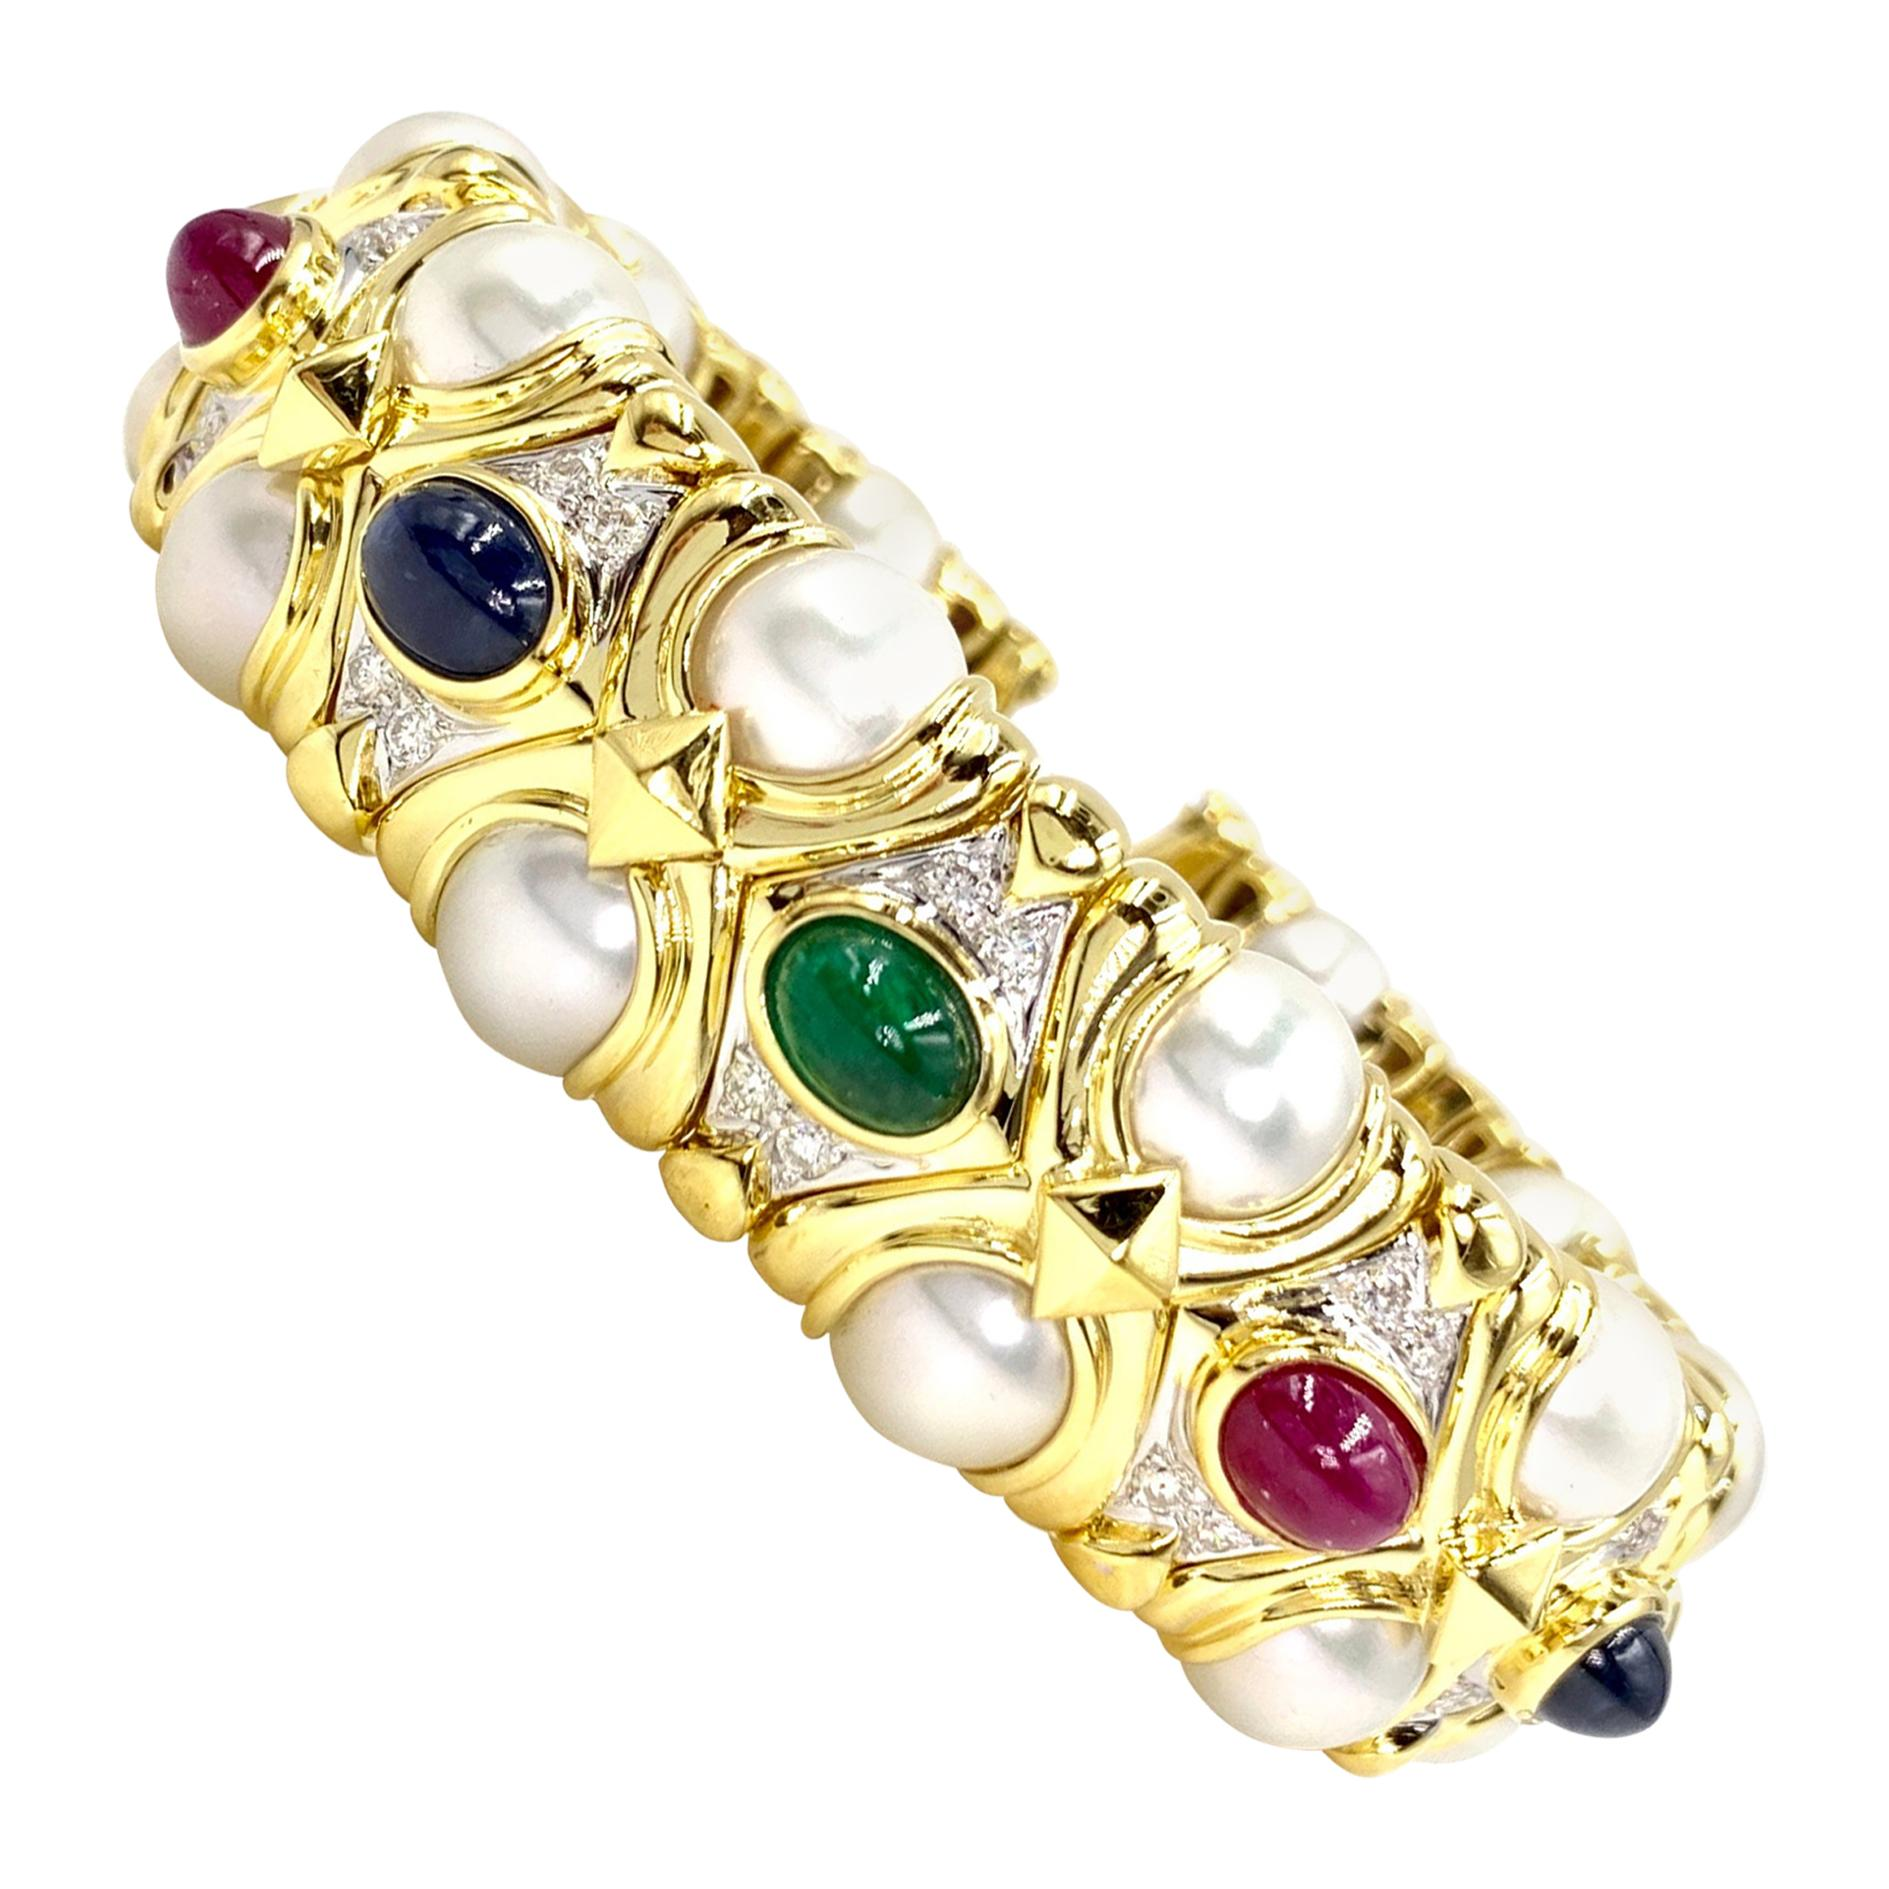 18 Karat Precious Gemstone, Diamond and Cultured Pearl Cuff Bracelet